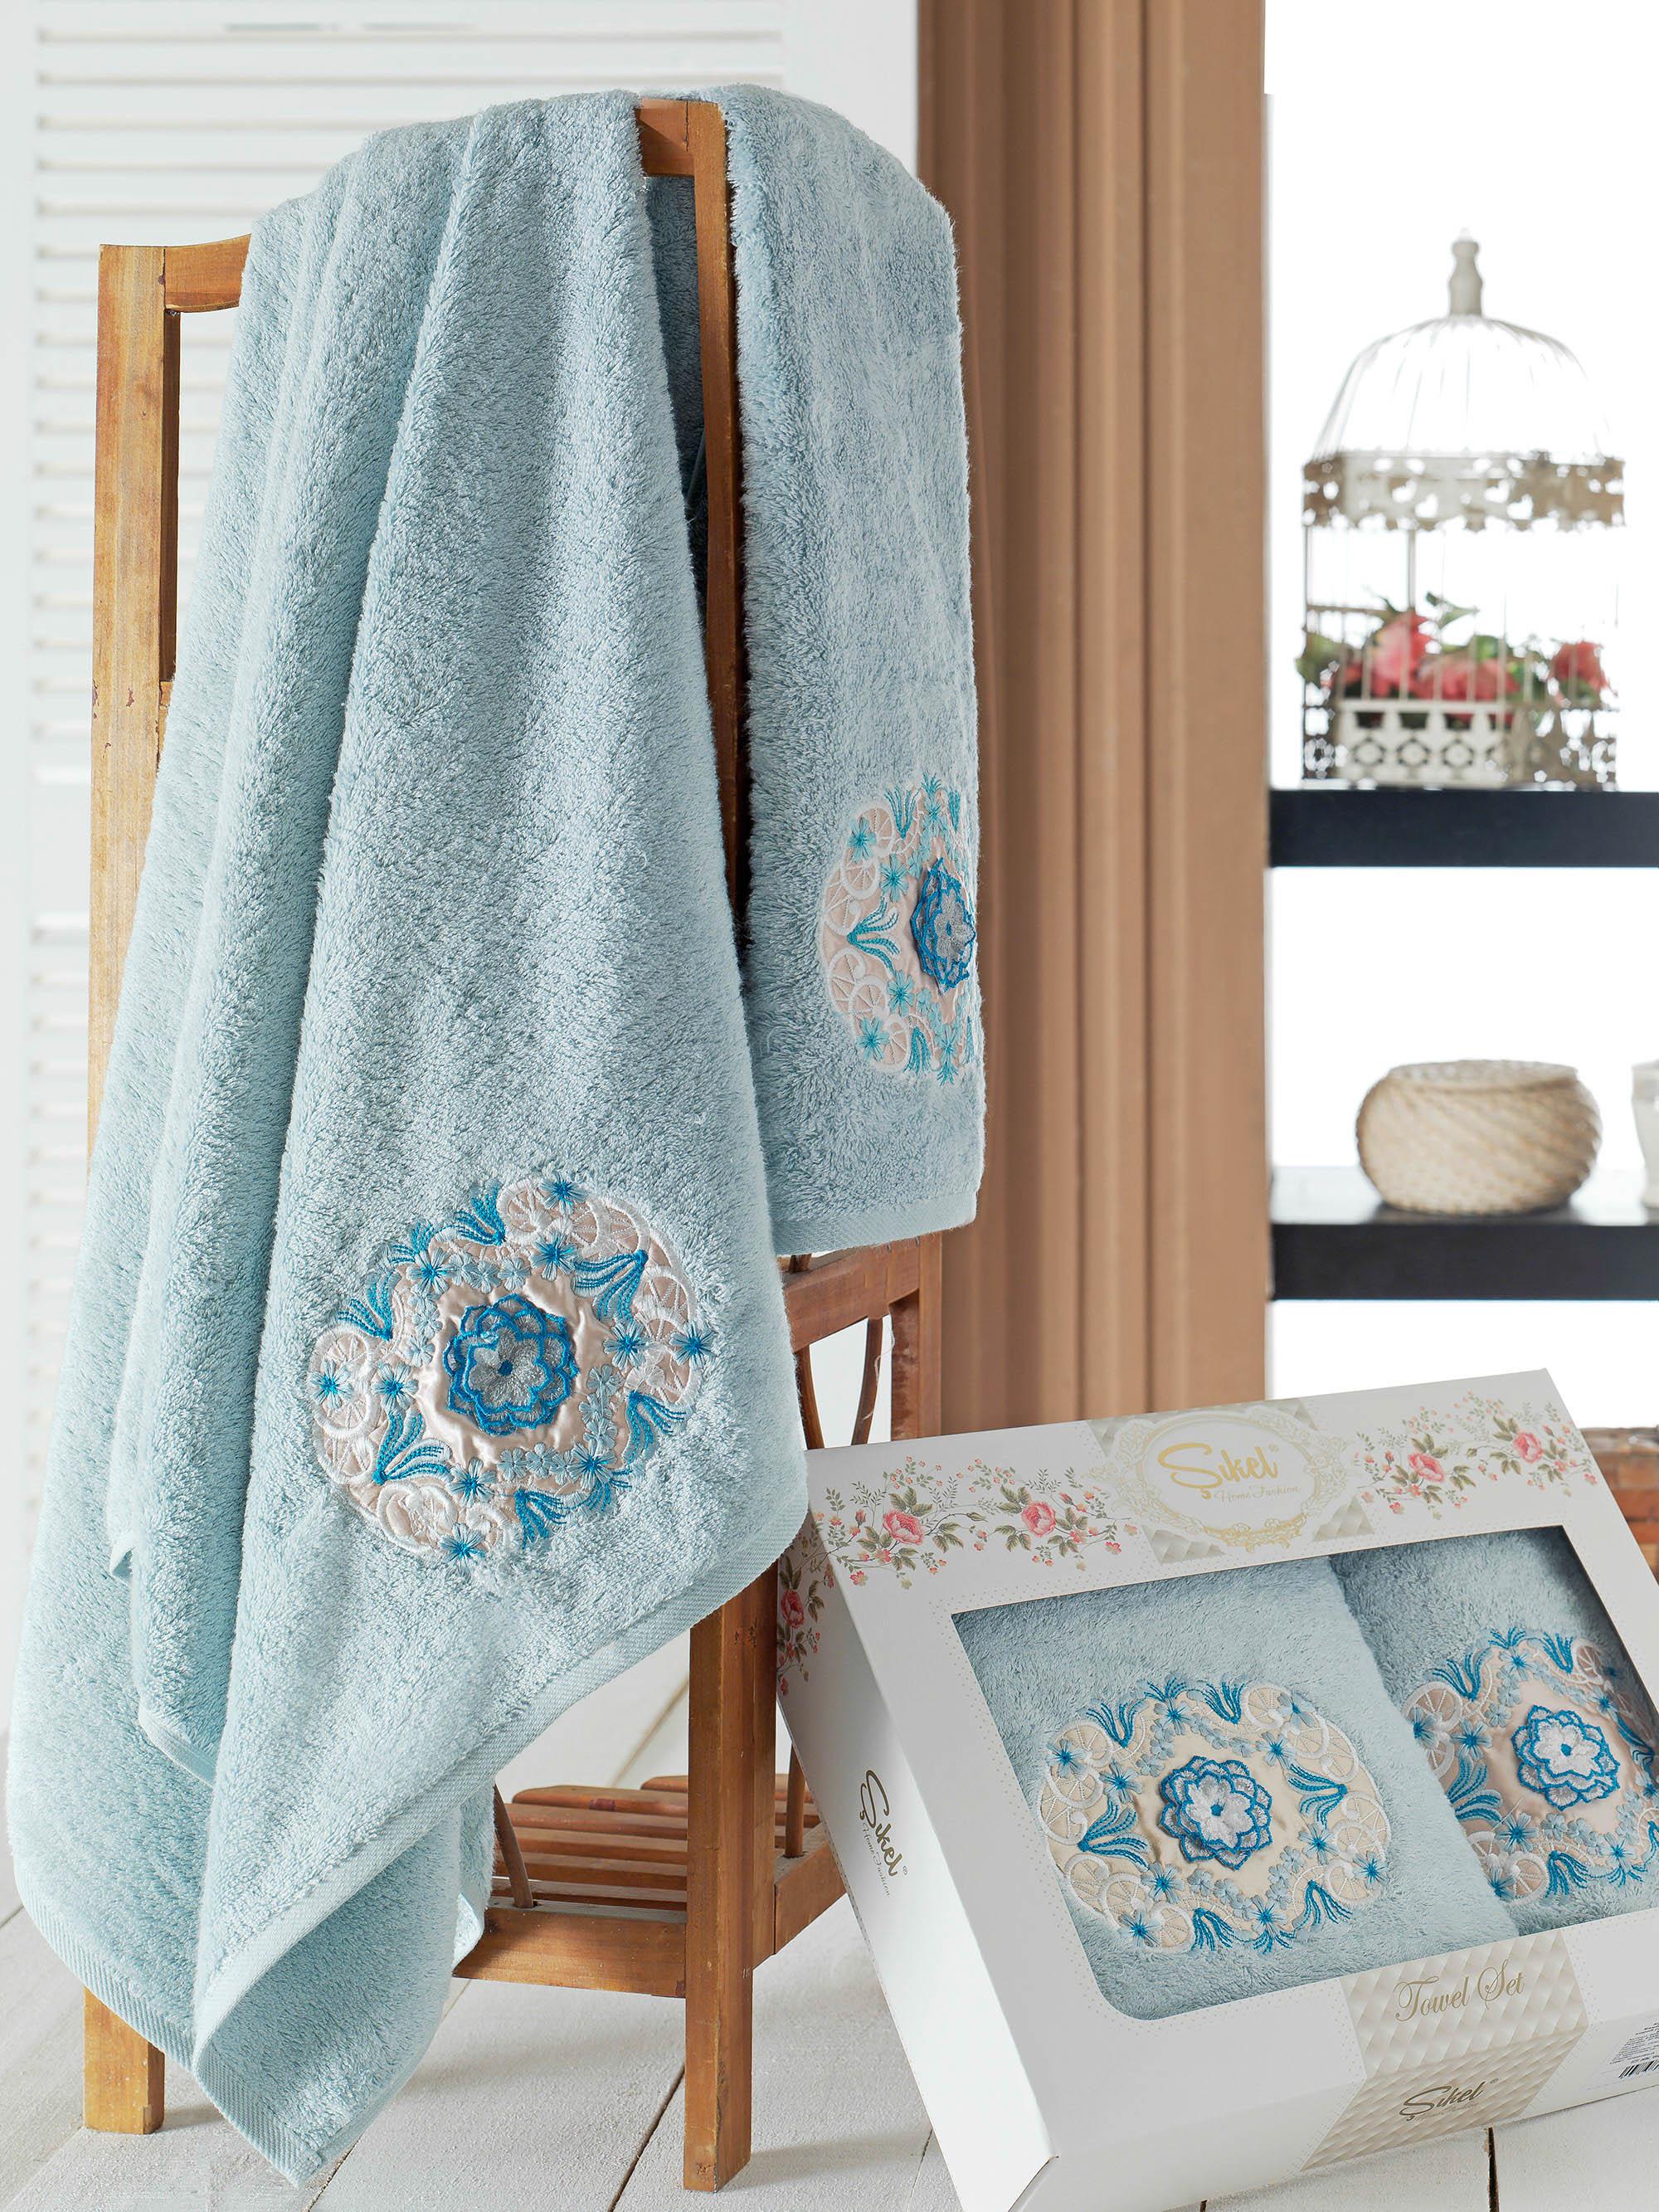 Полотенца Sikel Набор из 2 полотенец Kamelya Цвет: Голубой набор из 3 полотенец merzuka sakura 50х90 2 70х140 8432 терракотовый